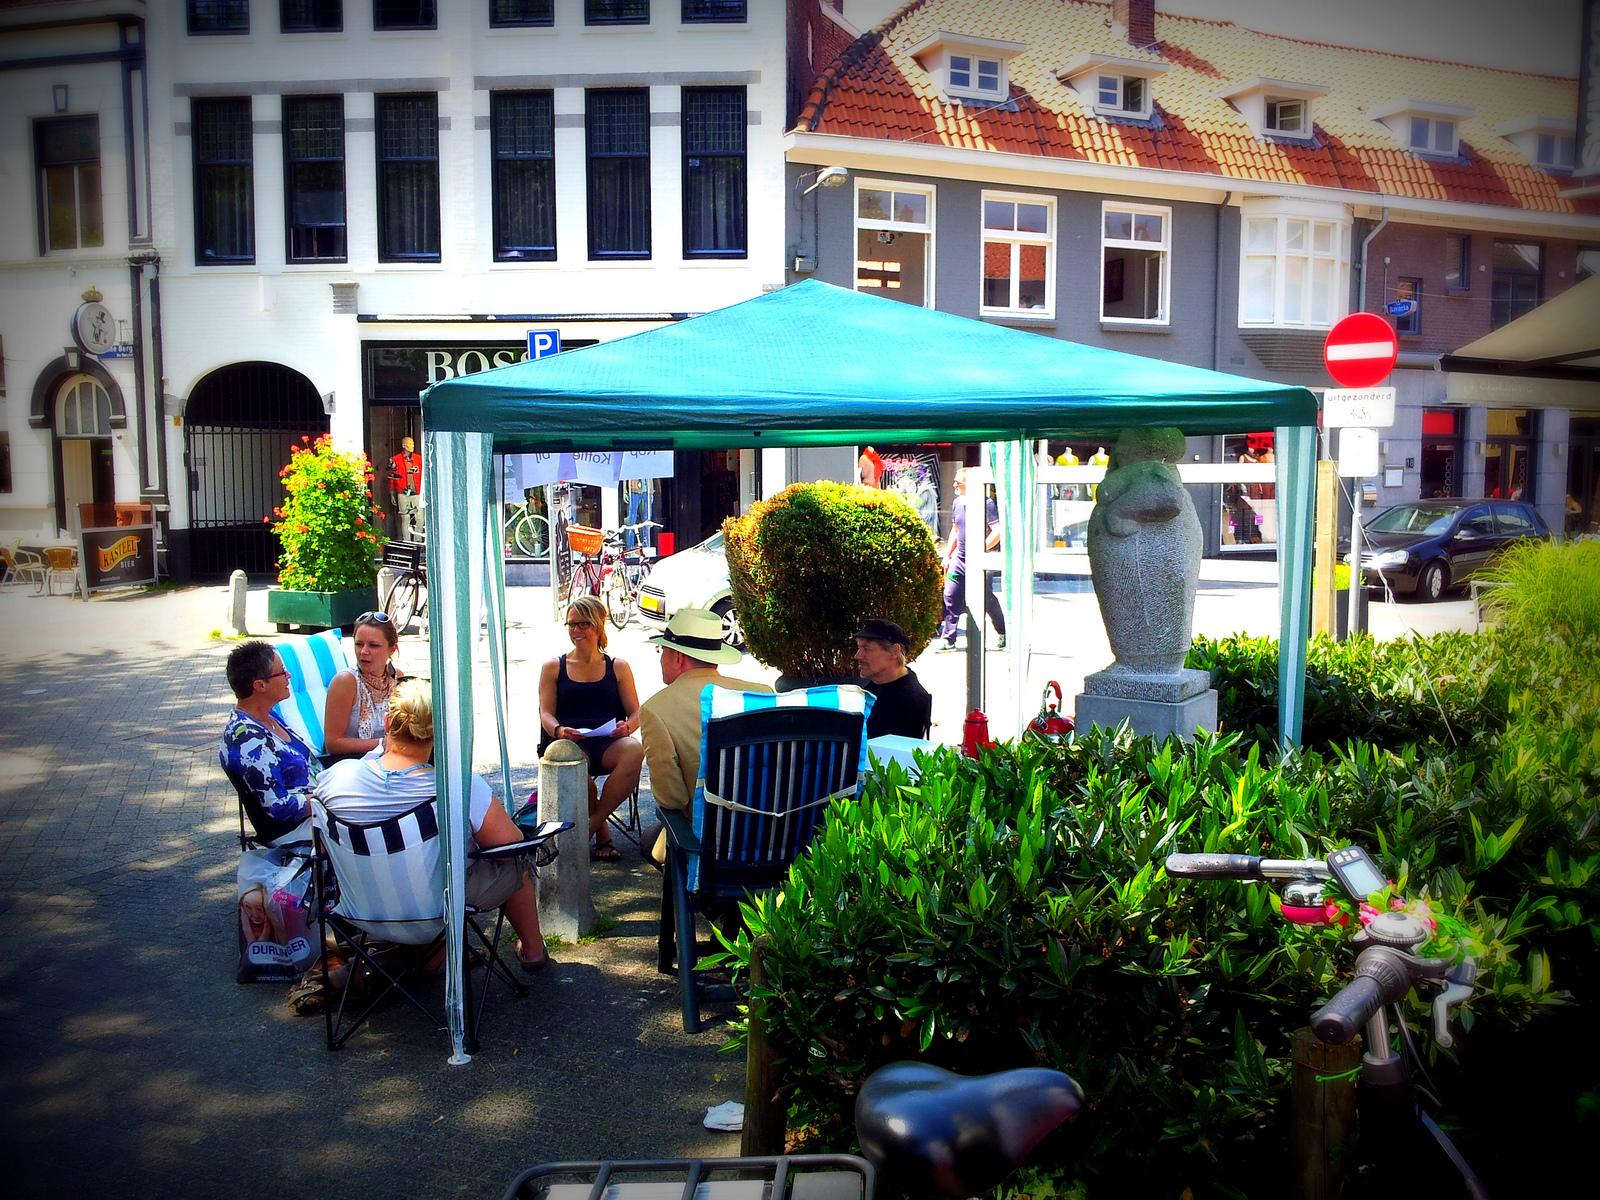 Geluksroute-Eindhoven-Kop-Koffie-bij-ons-Moeder - CoachSander.nl